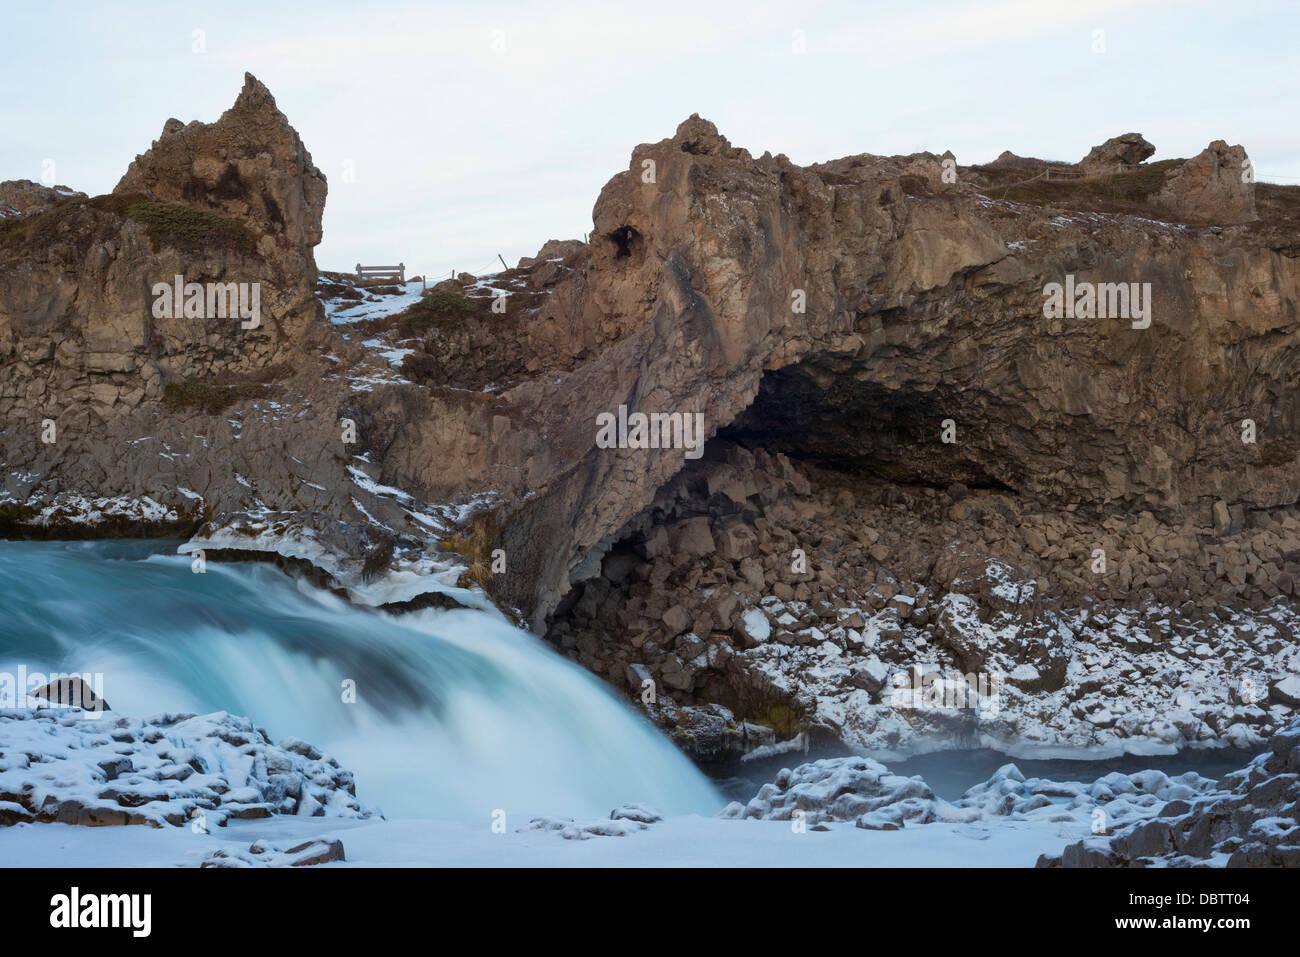 Cascate Godafoss, Islanda, regioni polari Immagini Stock